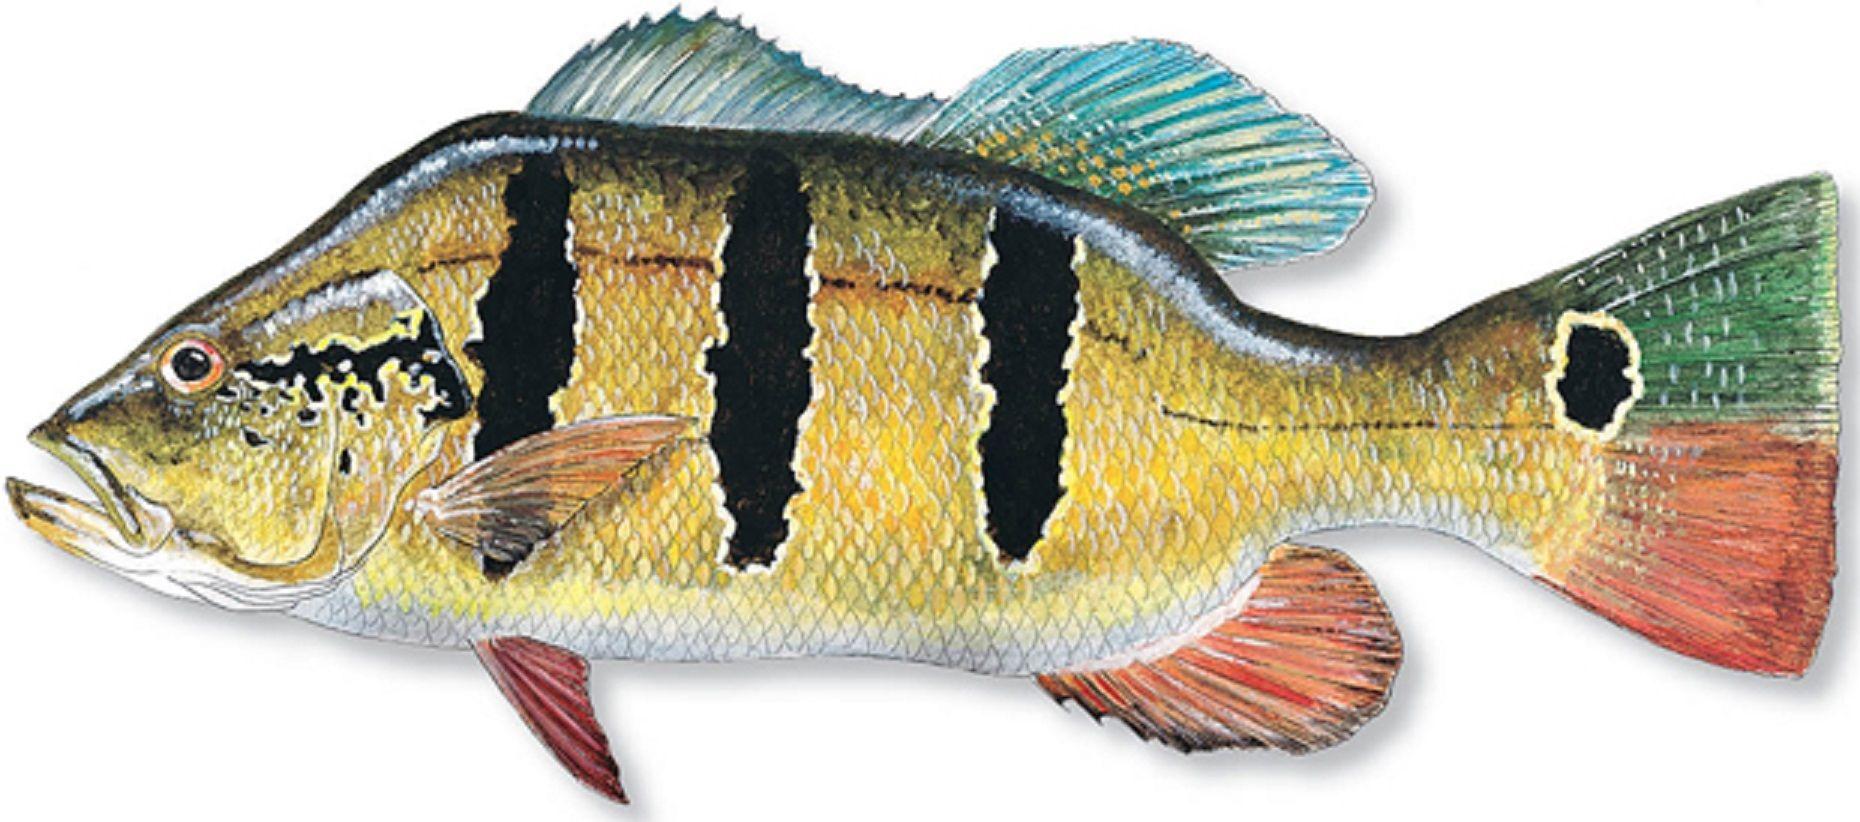 Art Illustration Lakes Freshwater Fish Peacock Bass